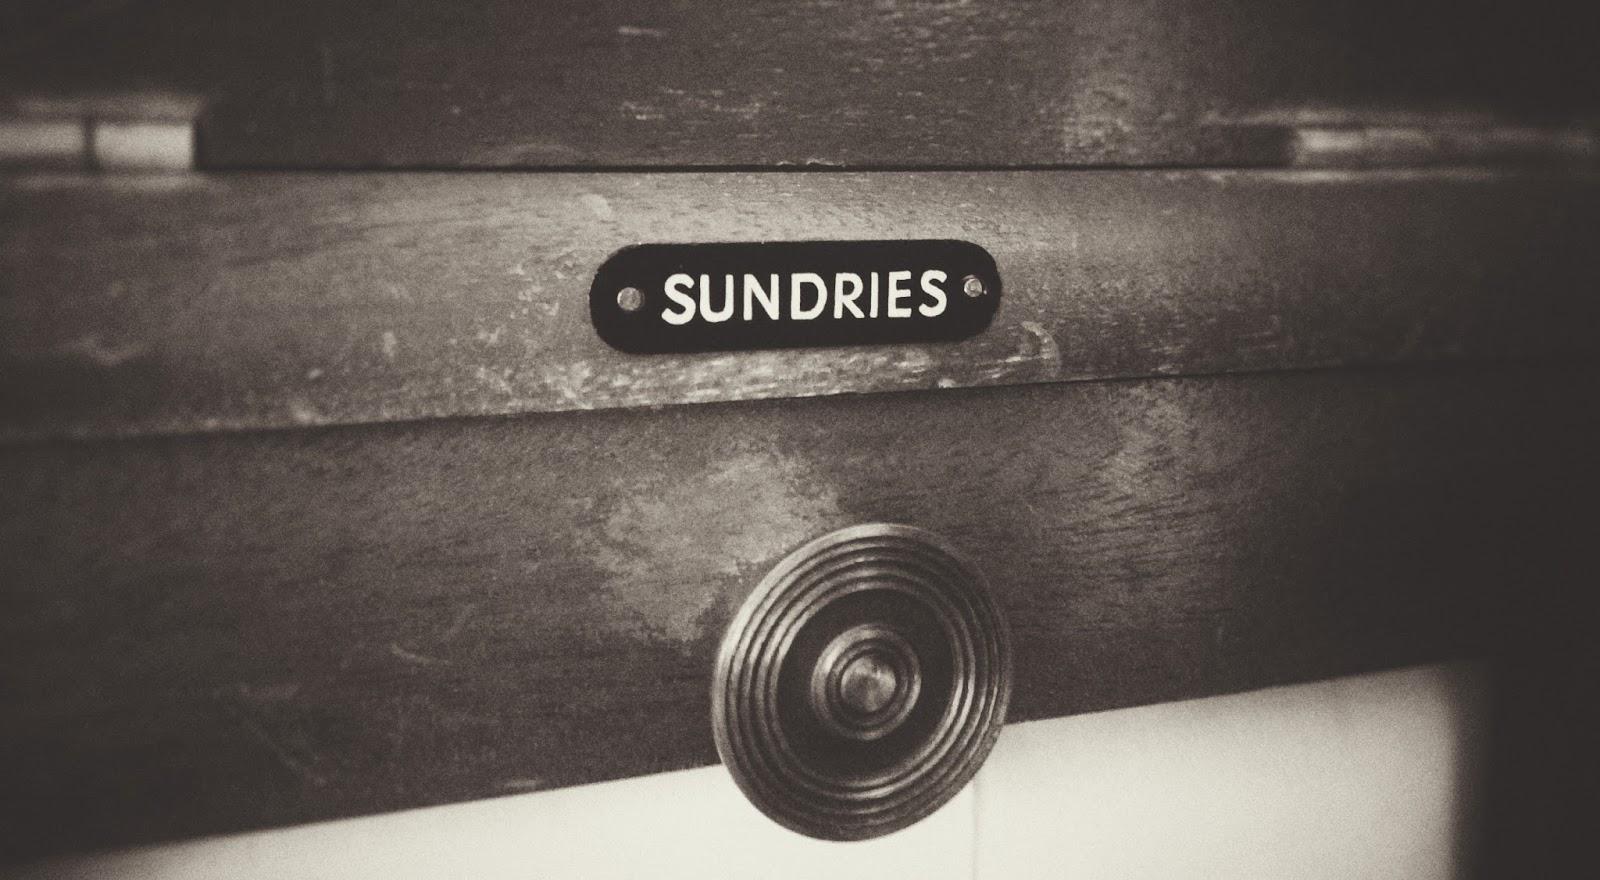 Sundries from the Gentleman's Wardrobe